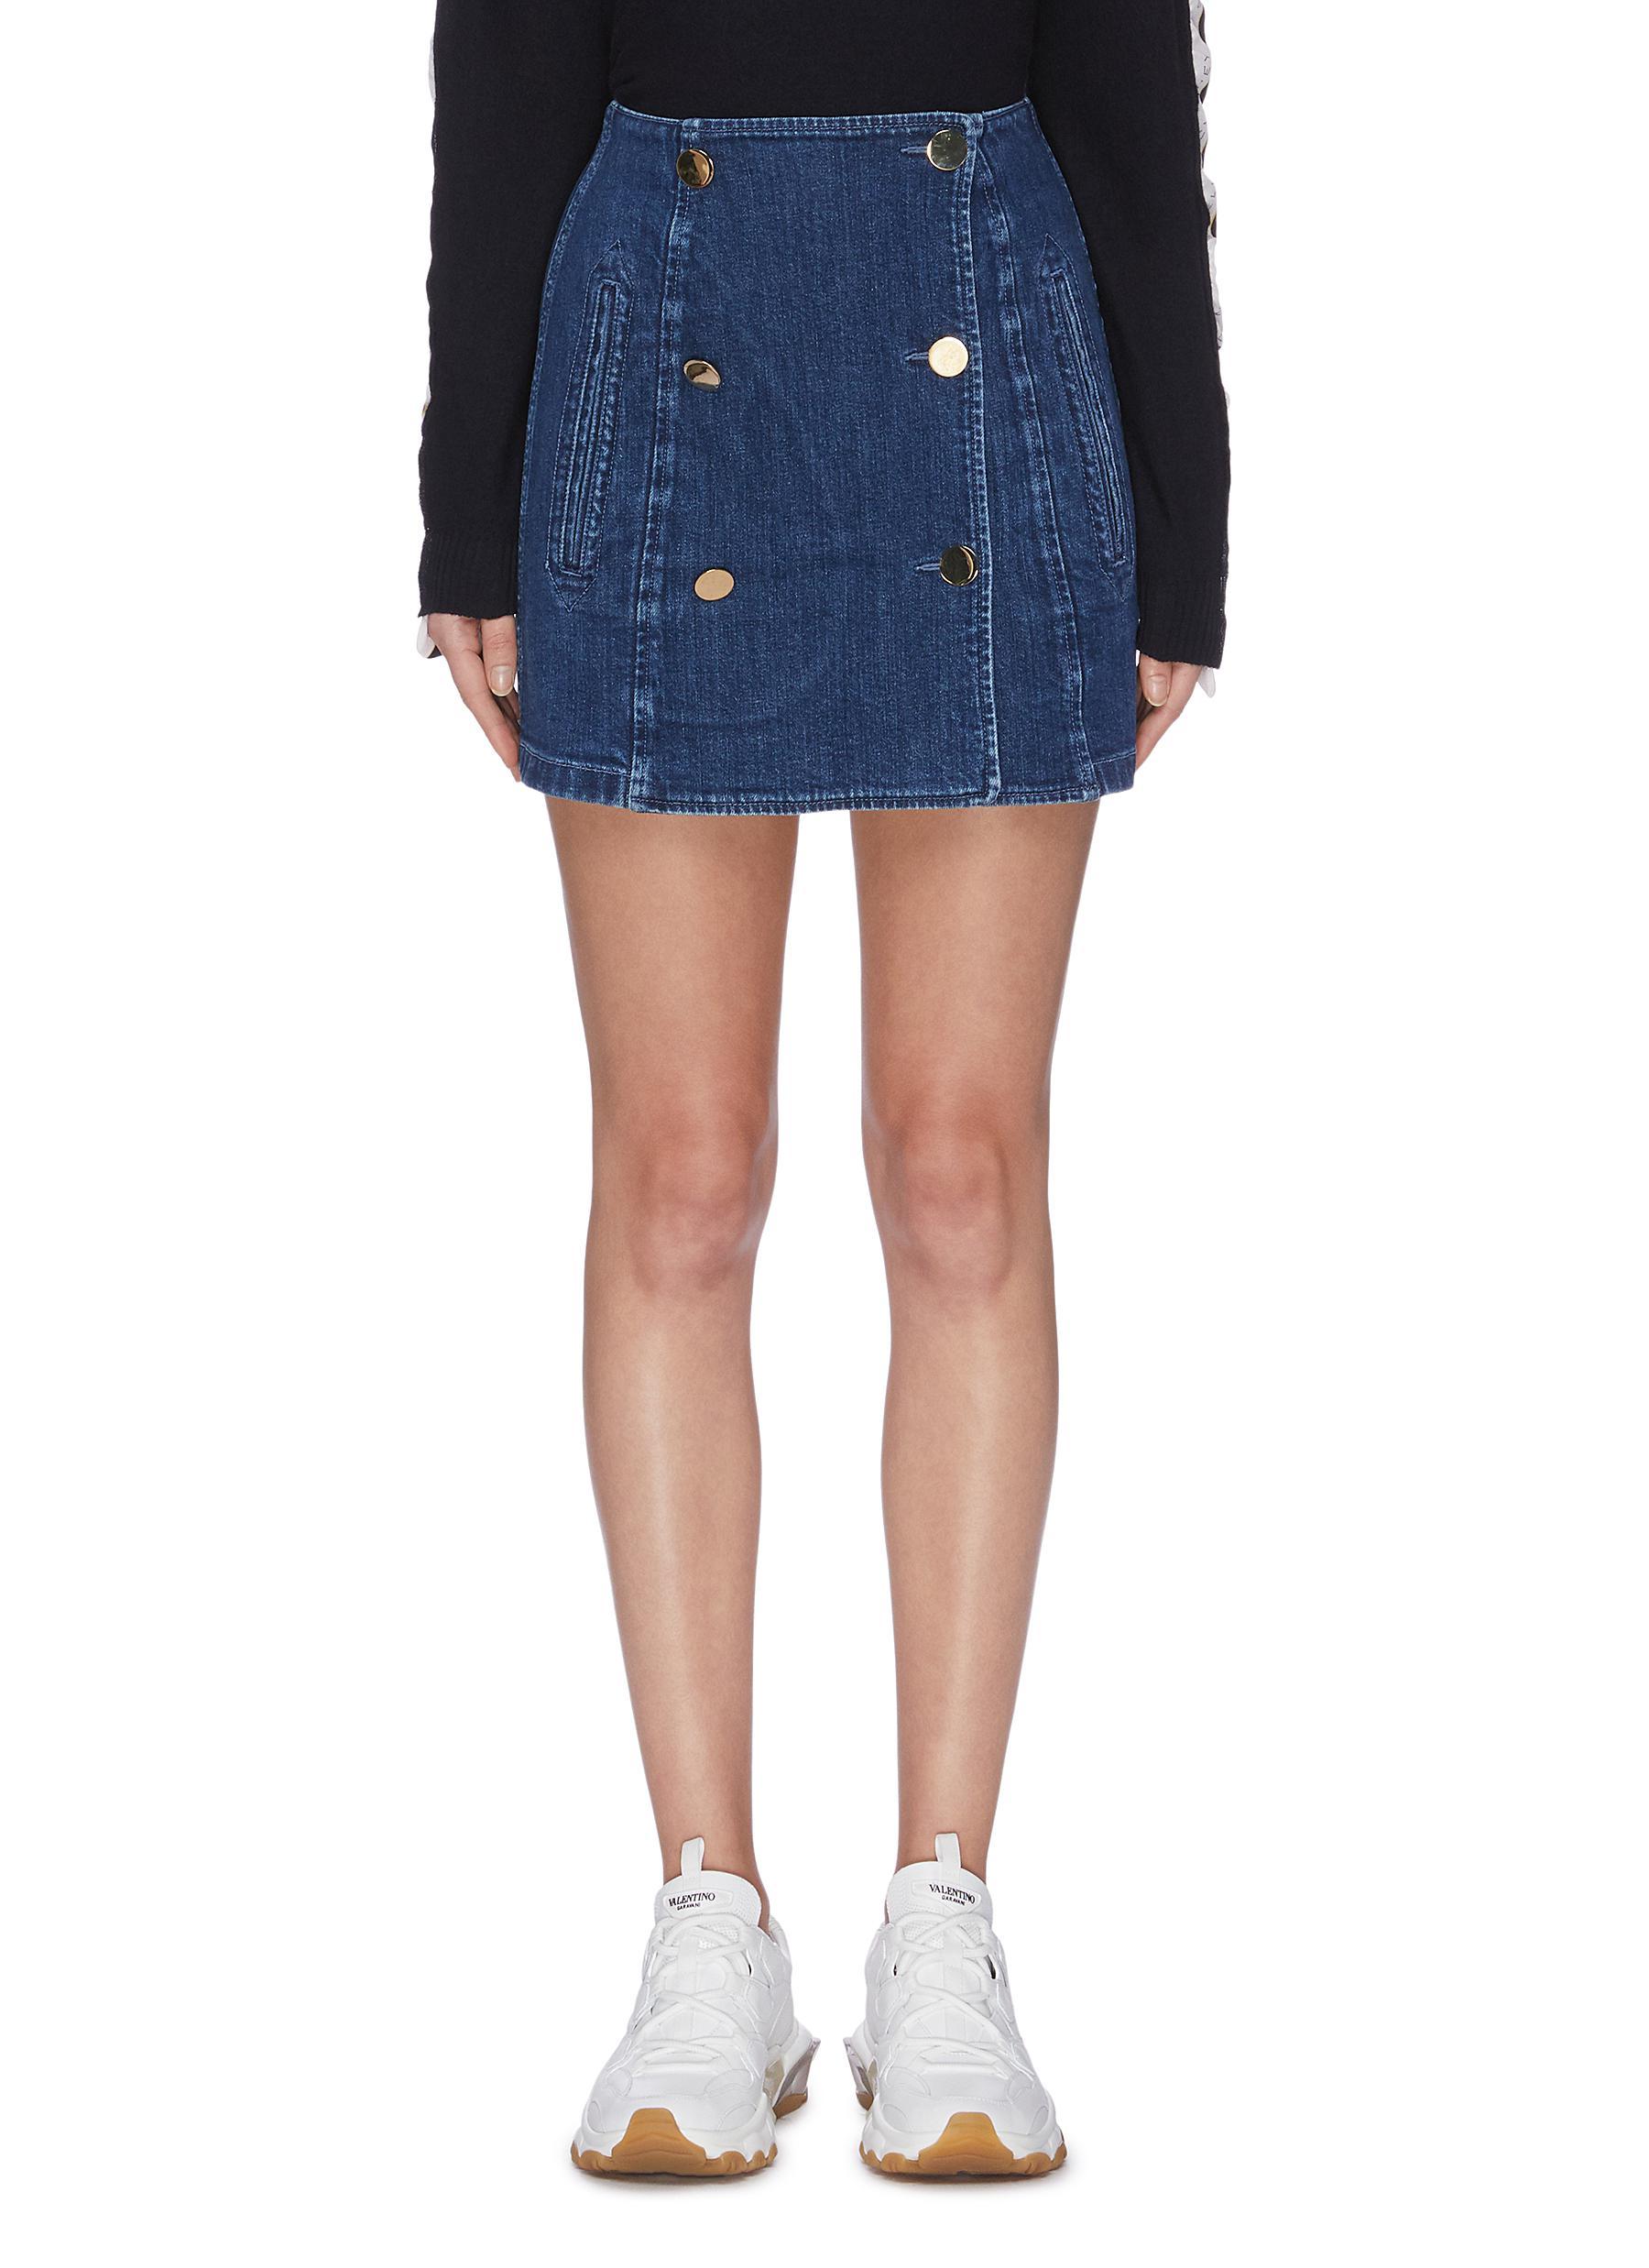 Buttoned denim skirt by Stella Mccartney